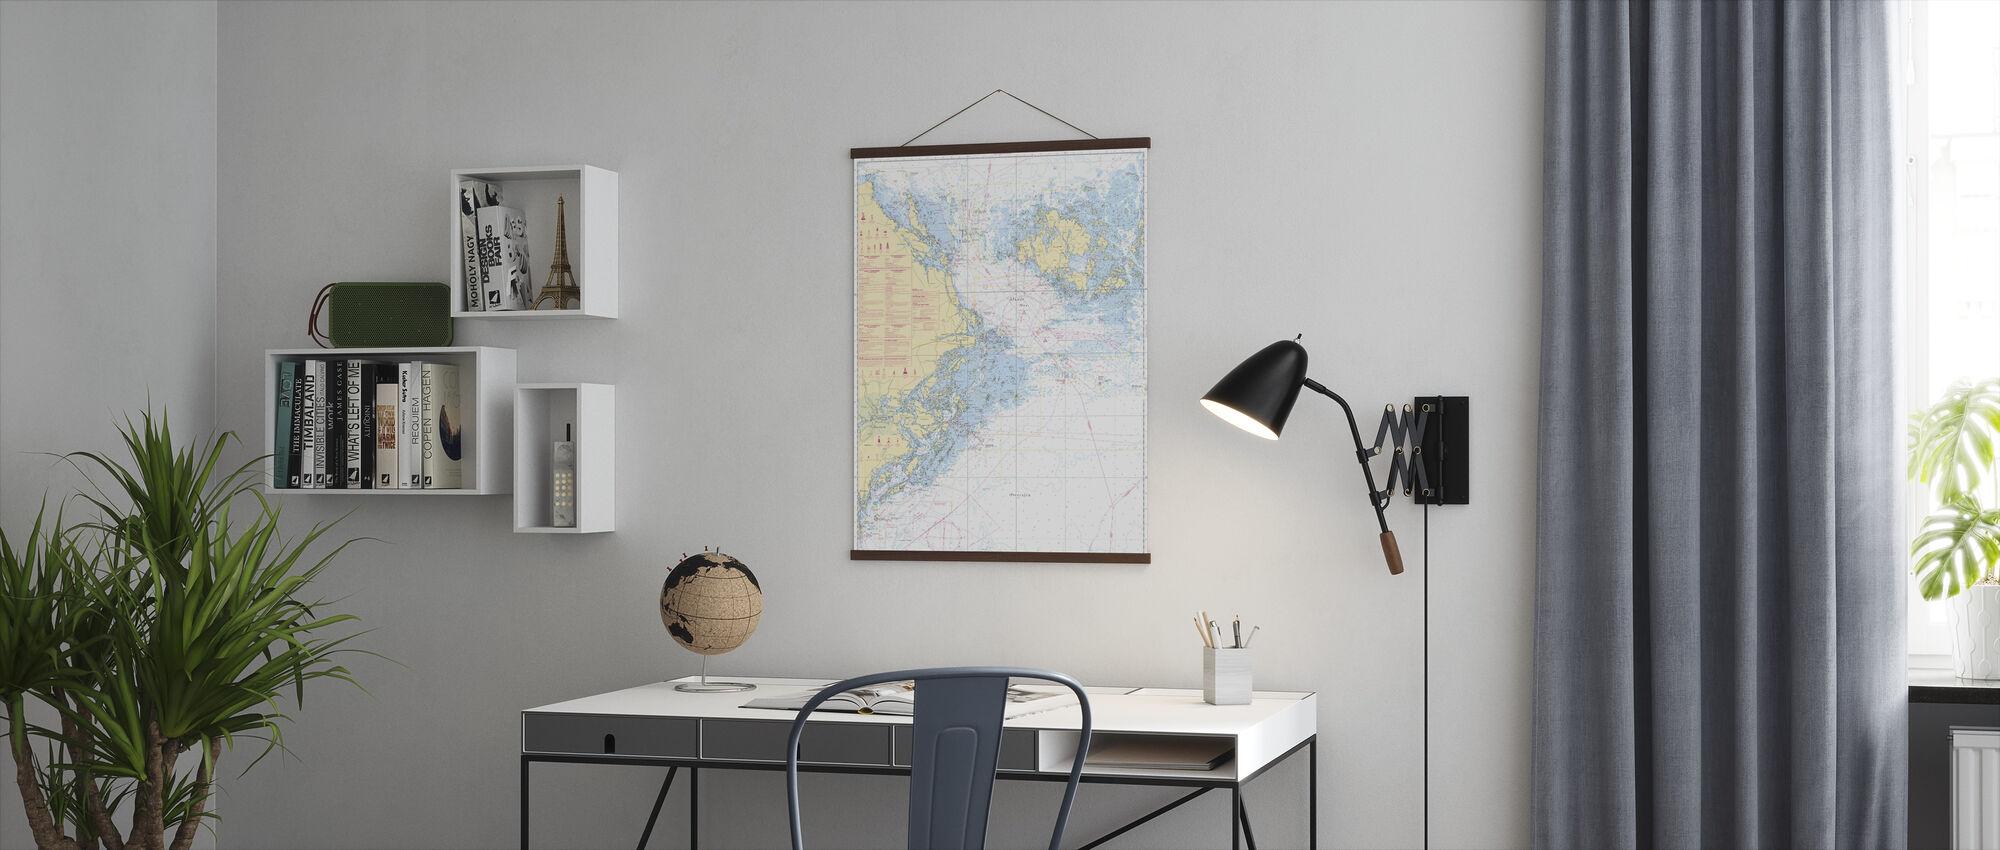 Sea Chart 61 - Landsort - Alands Hav - Poster - Office